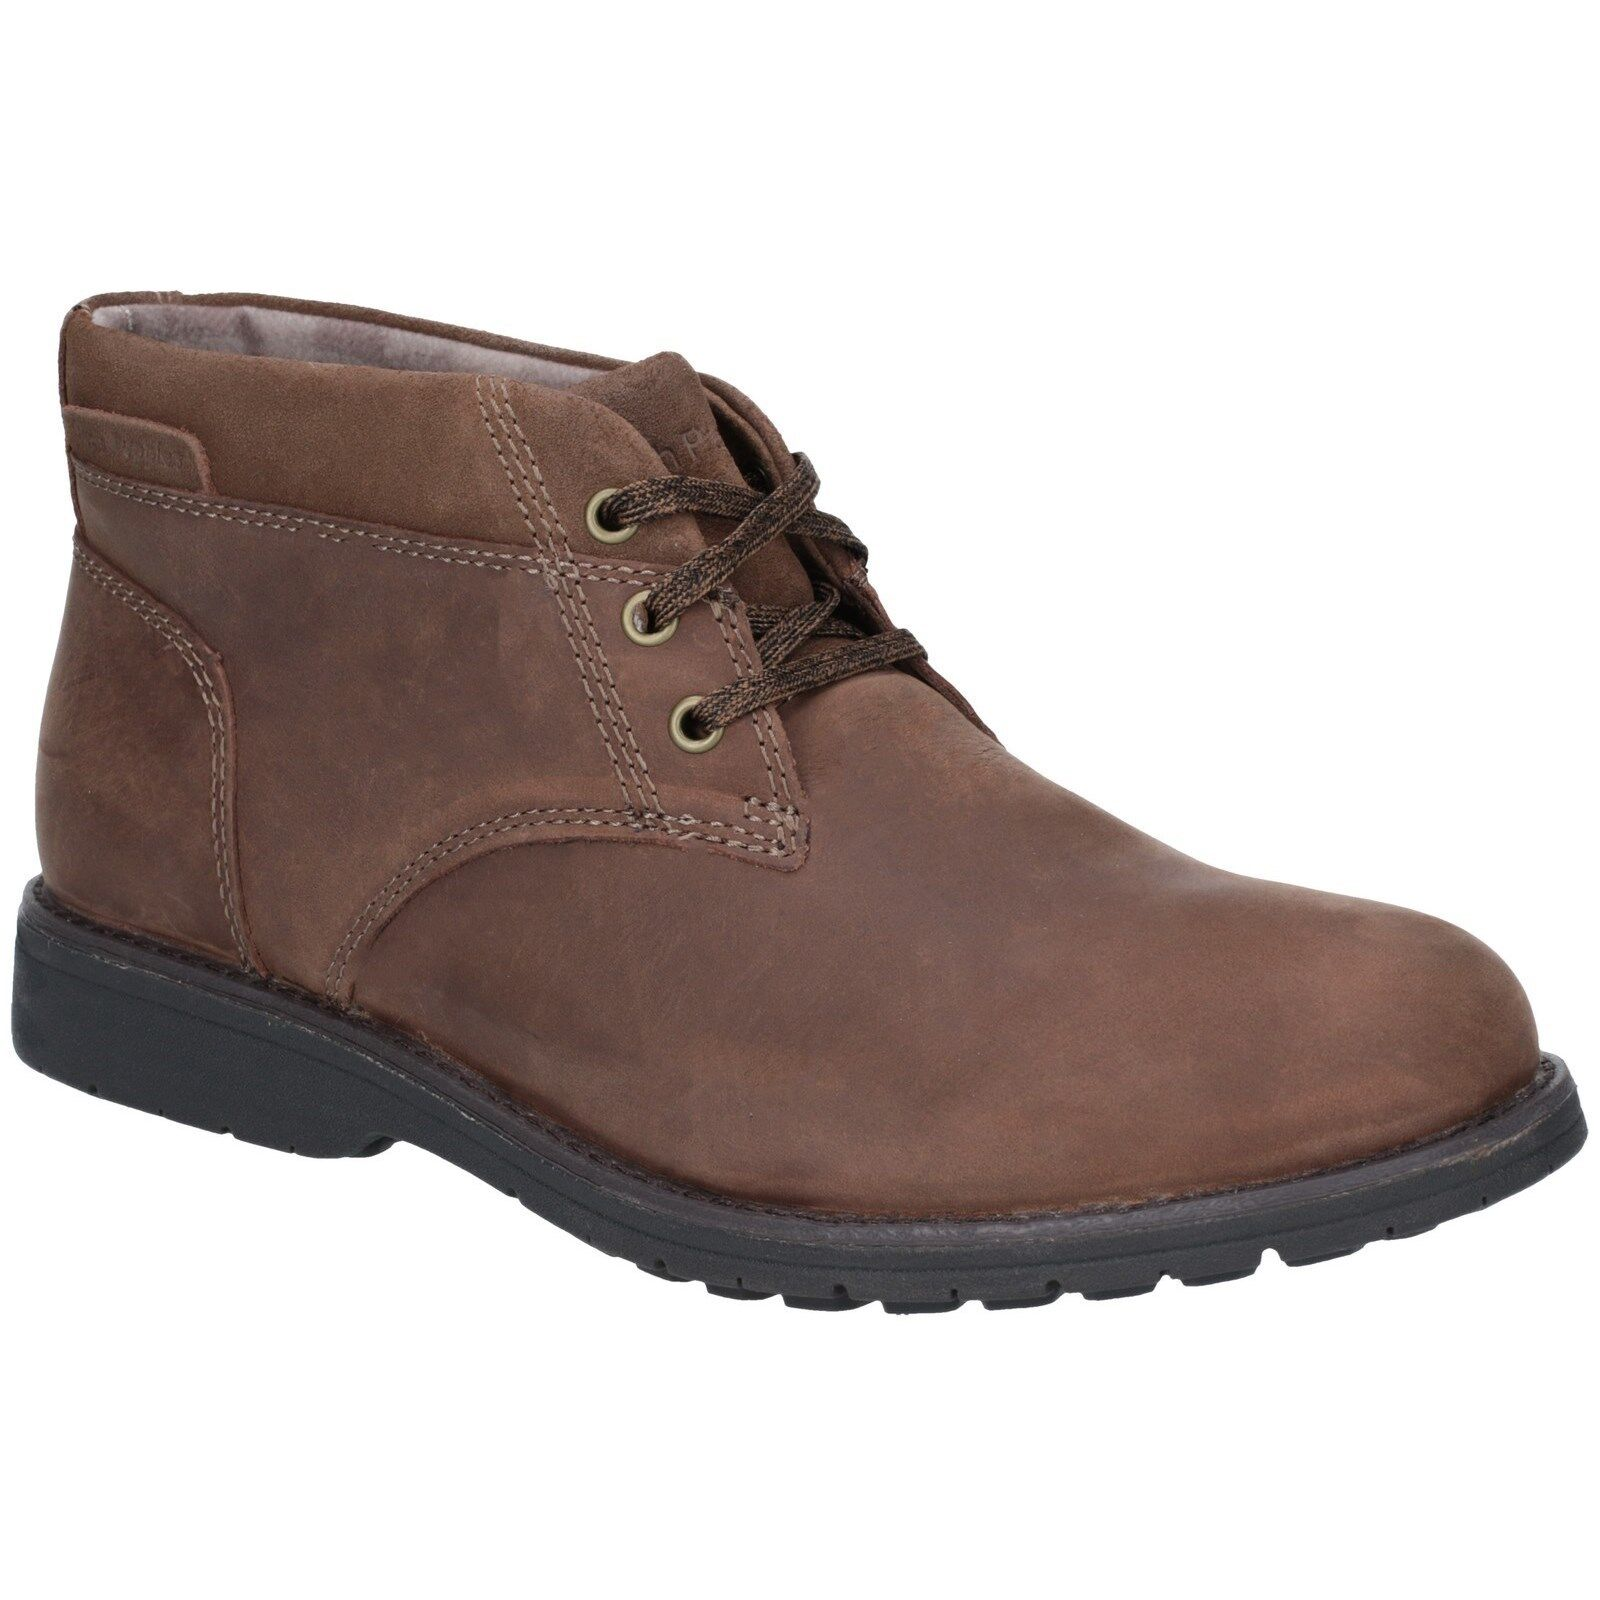 calzados hush puppies paraguay, hombre Botines & Low boots